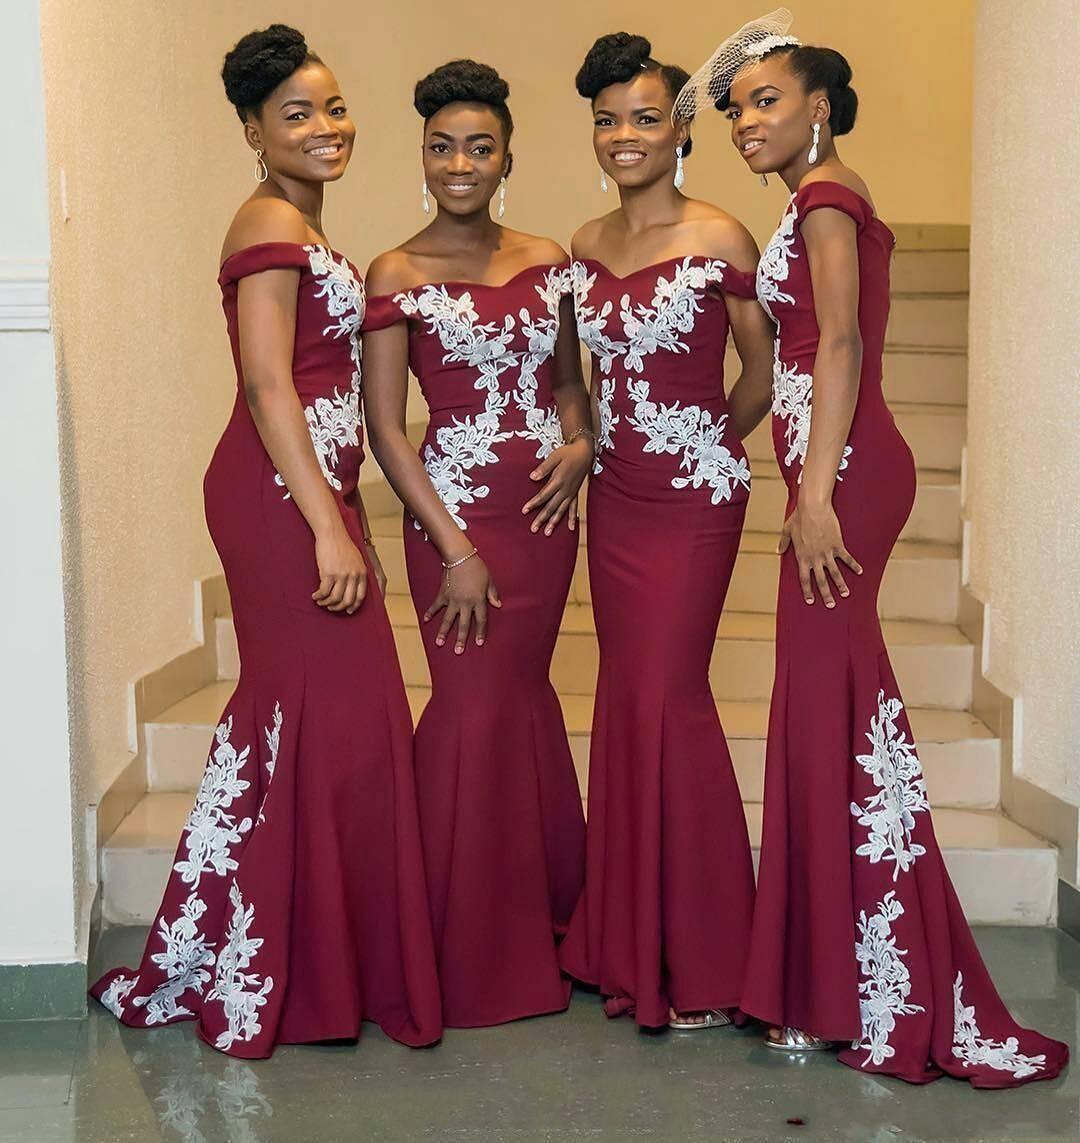 78cea68b0c8a 2018 Black Girls Dark Red Mermaid Bridesmaid Dresses Nigerian Off Shoulder  White Appliques Satin Long Wedding Party Dresses Sweep Train Grey  Bridesmaid ...